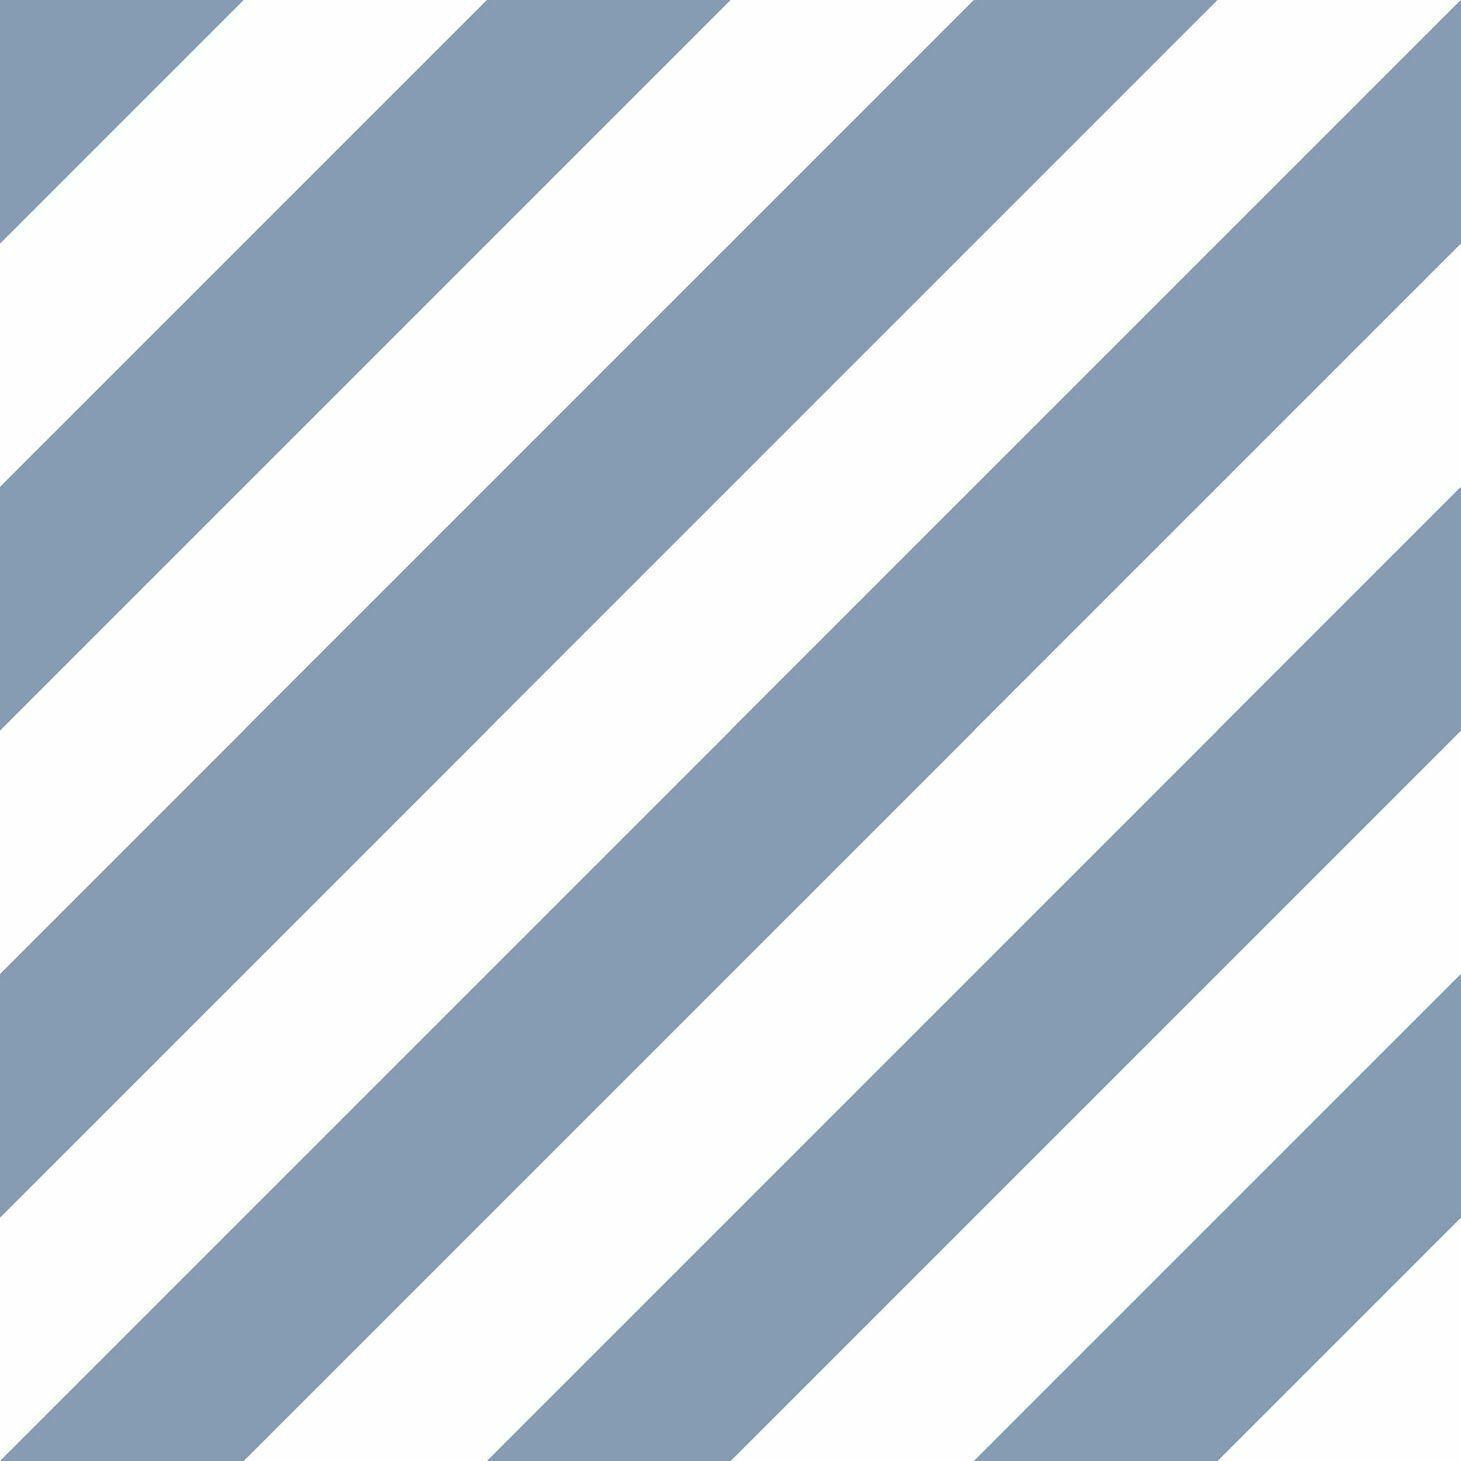 Essener Tapete Simply Stripes 3 St36916 bluee Stripes Striped Vinyl Wallpaper